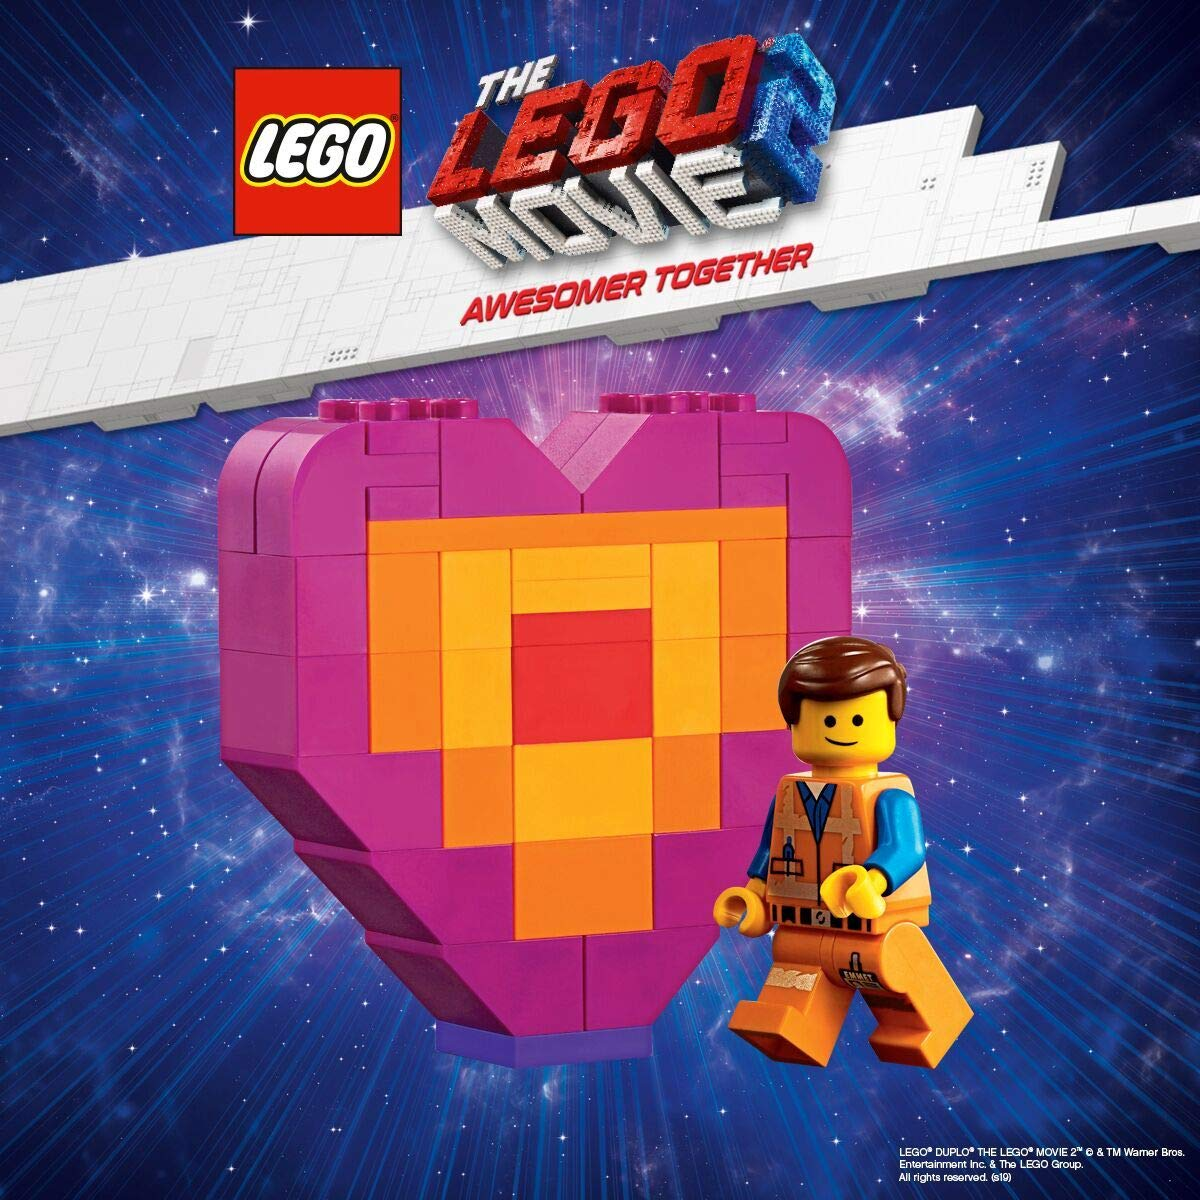 Lucy VS Alien Invader Character Minifigure Triple Pack Friends LEGO Master Metal-Beard Movie 2 Block Building Kit Emmet Mini Figure with Piece Offering Heart